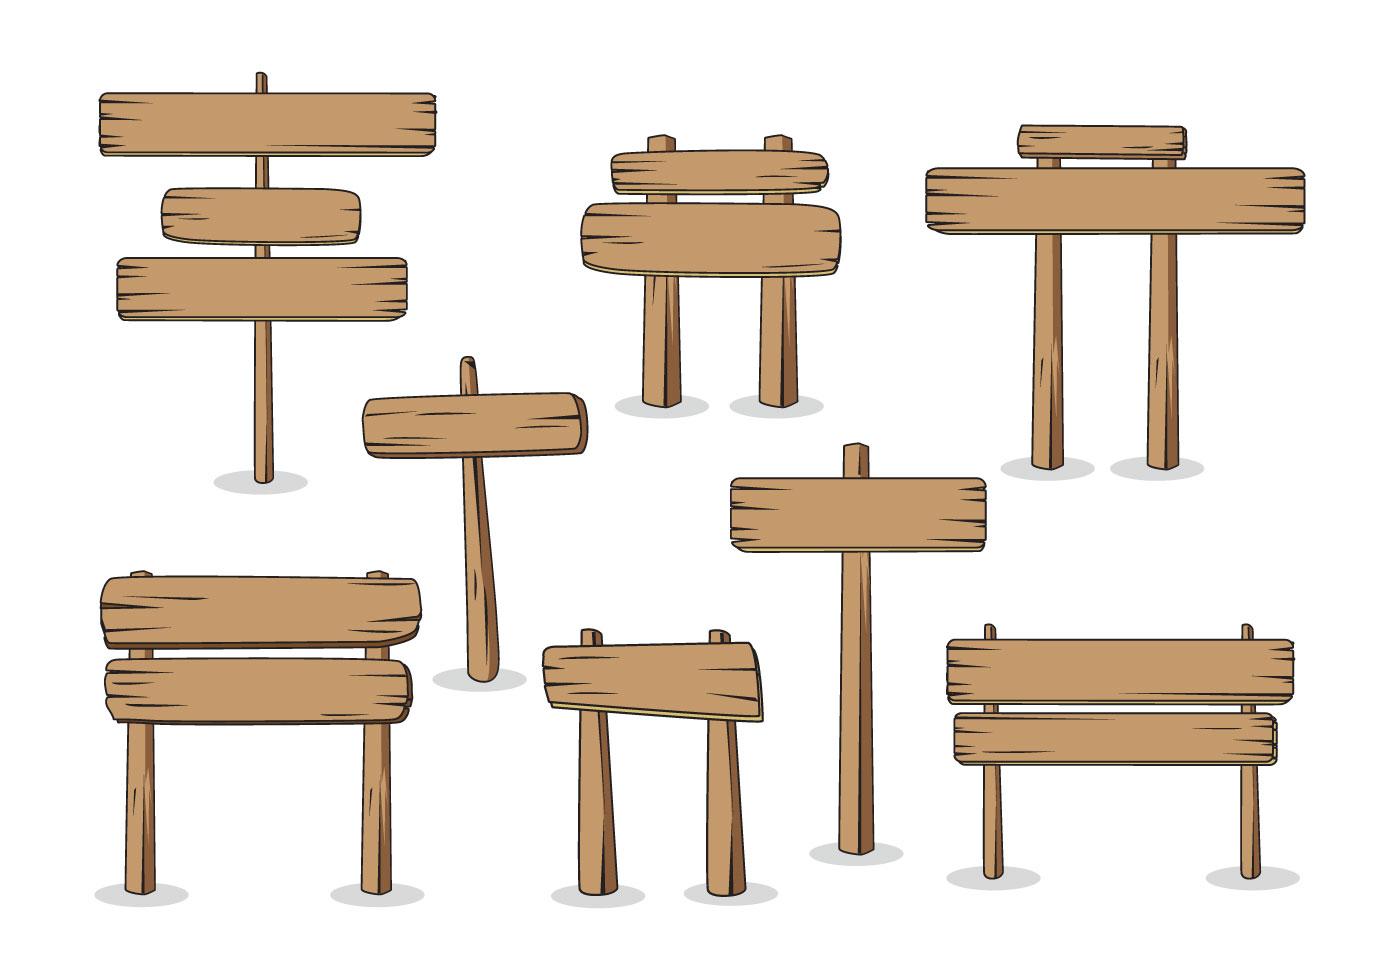 Madeira Wooden Signs Board Vectors - Download Free Vectors ...